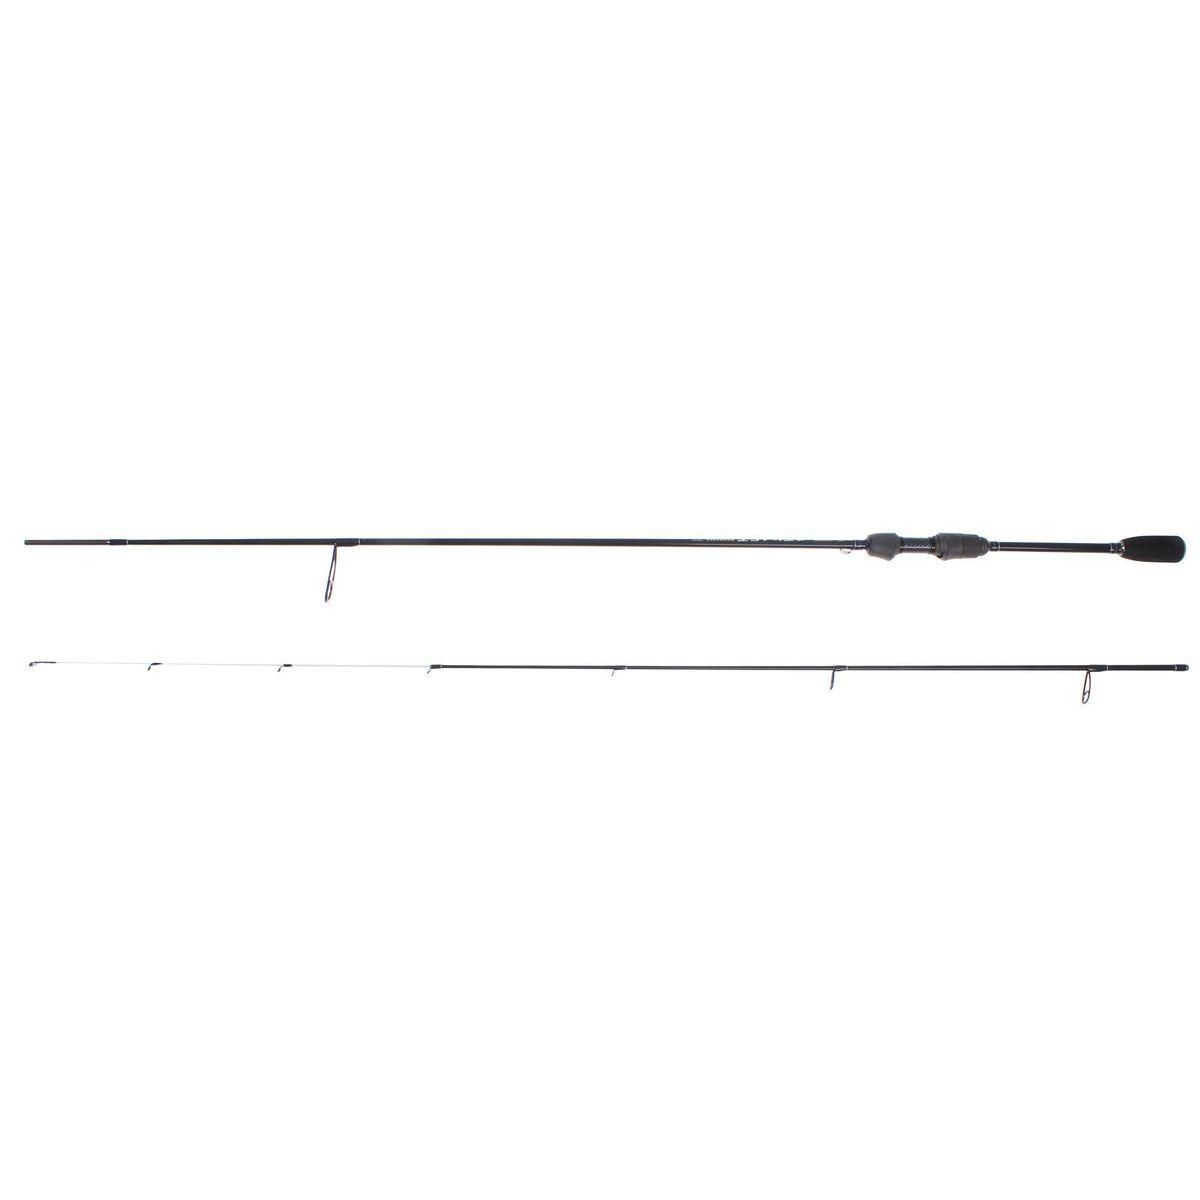 Спиннинг Волжанка Стилет, 2,13 м, 1-6 г спиннинг волжанка метеор 2 4 м 15 42 г